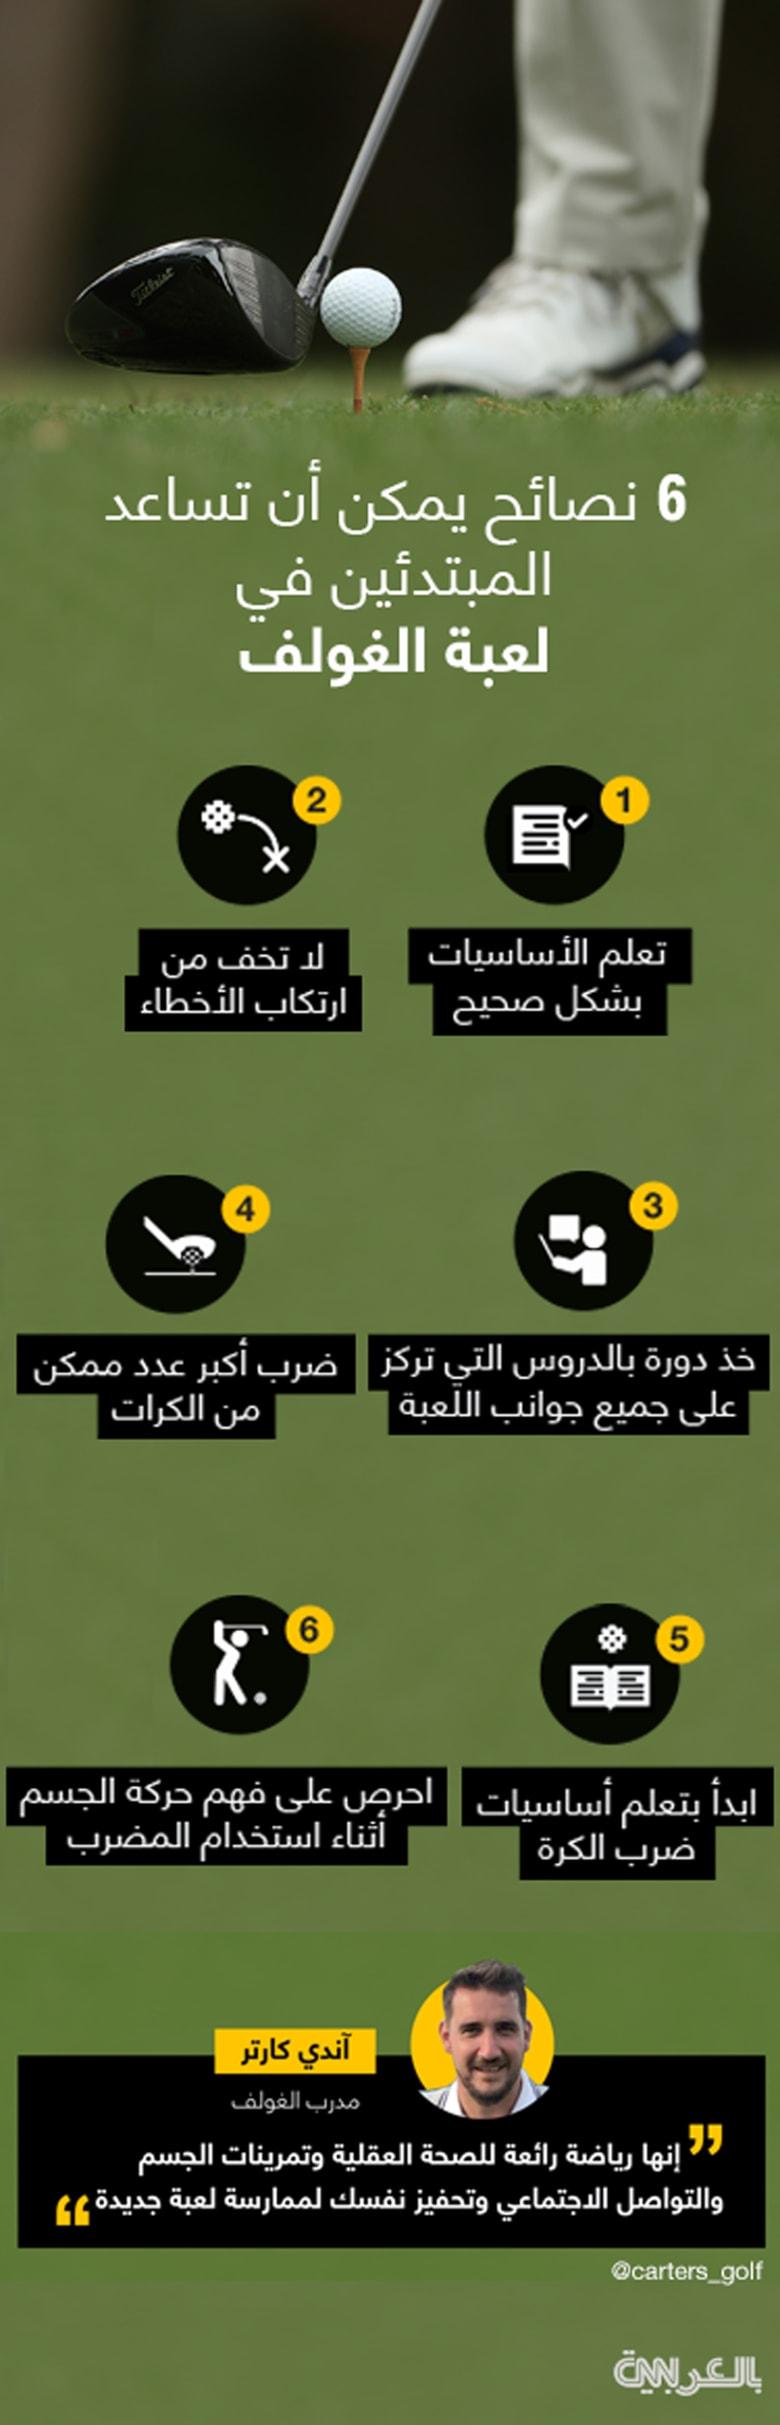 6-Golf-tips